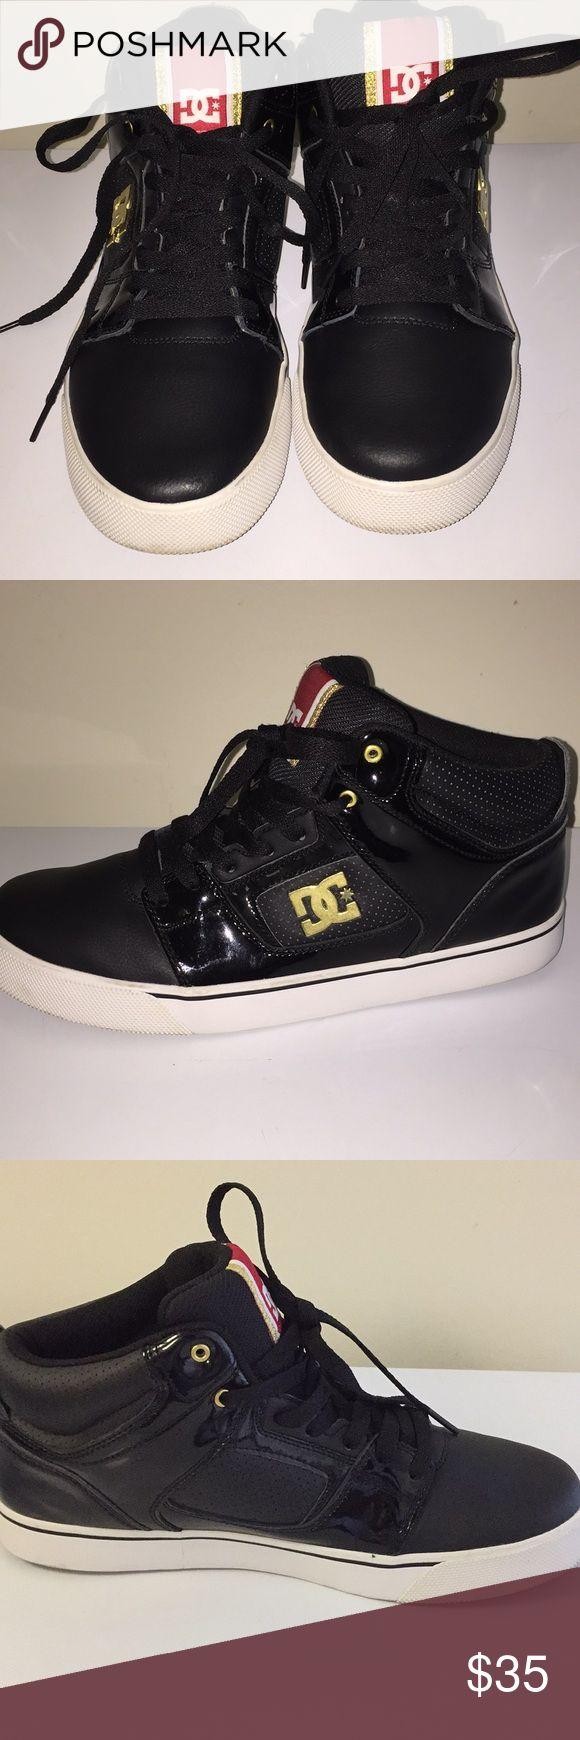 DC Sneakers Very Gently worn Men's Sneakers DC Shoes Sneakers